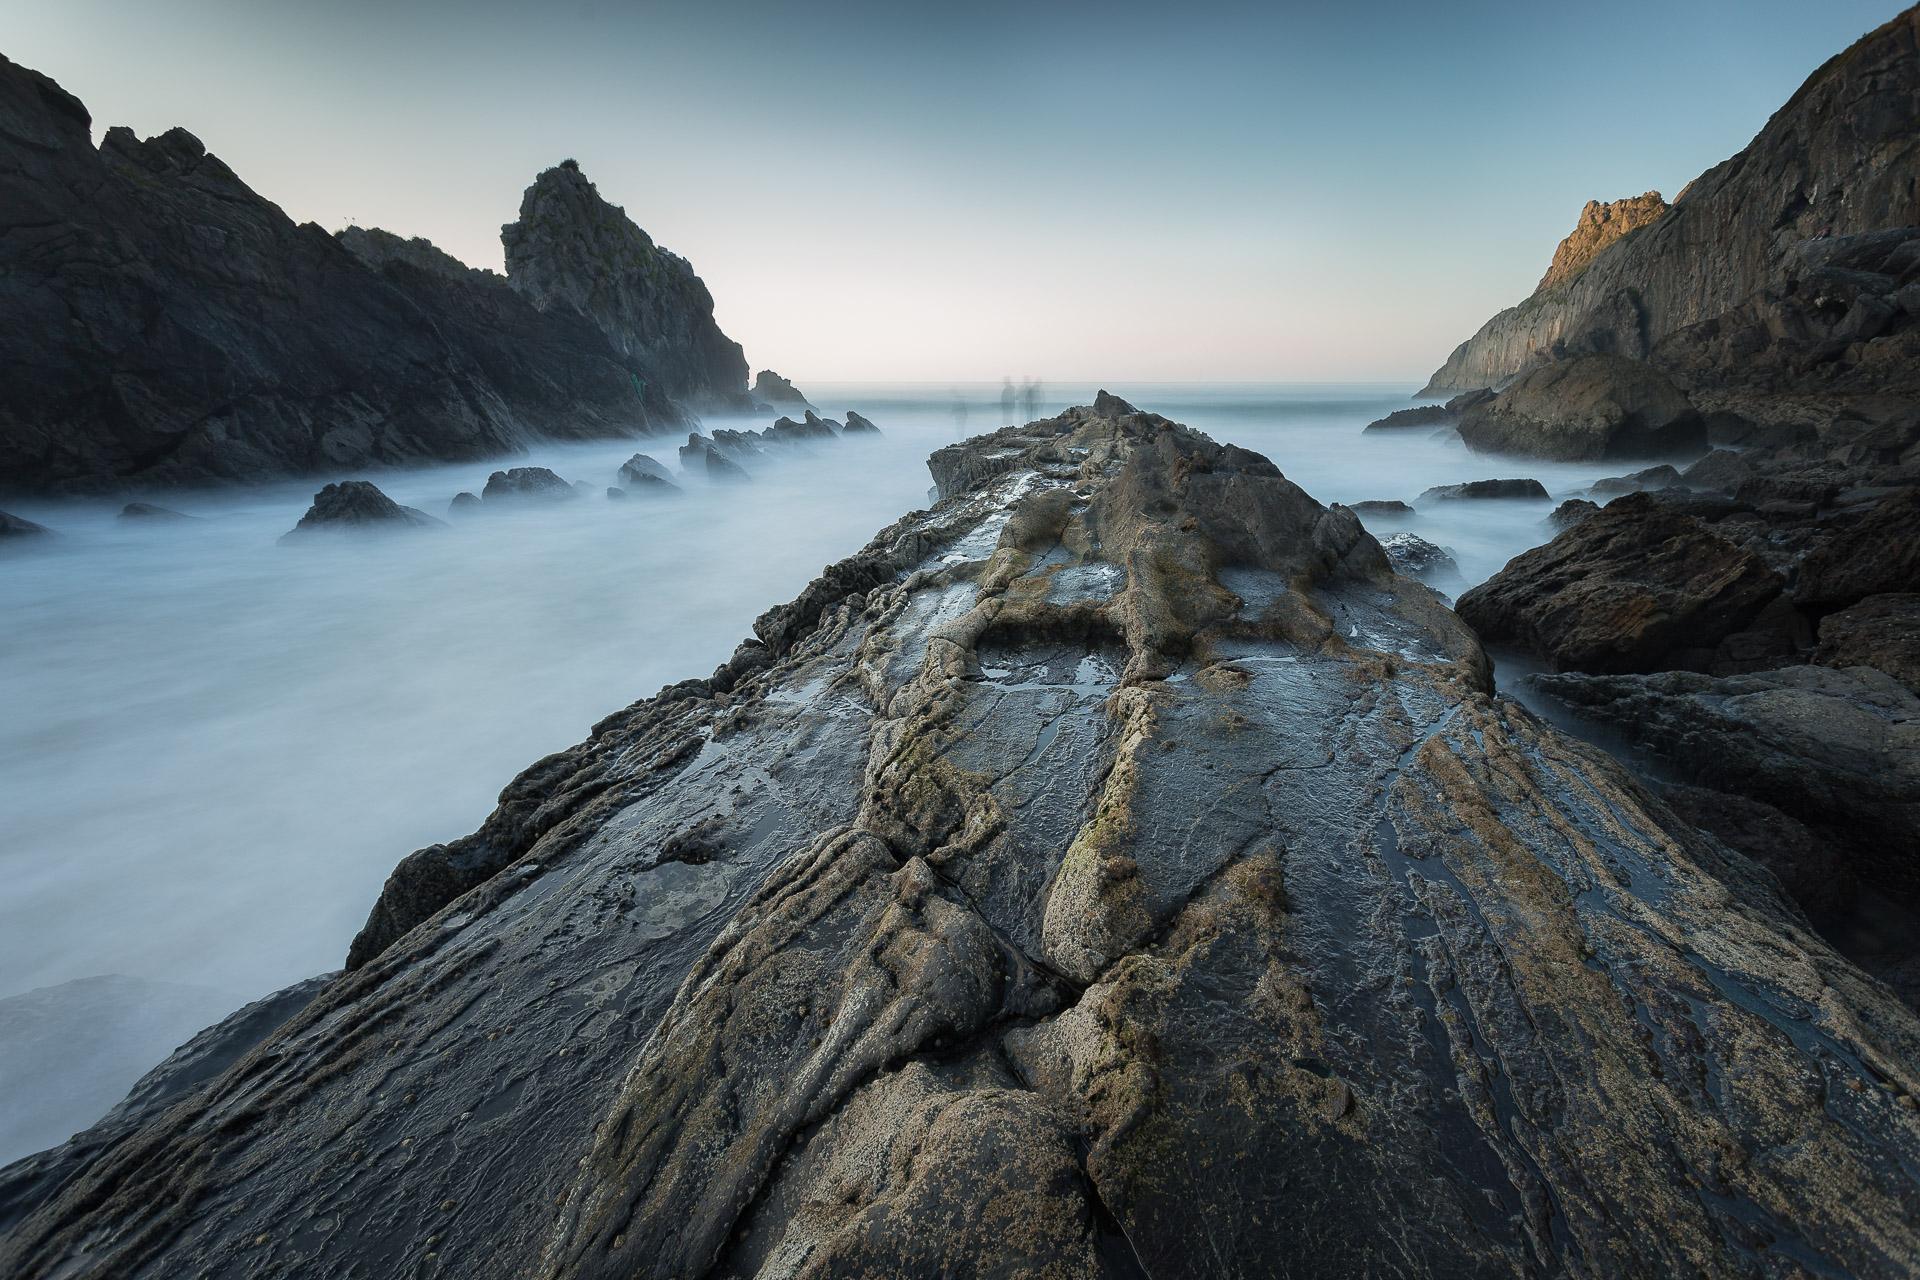 Fotografía de paisaje en Playa de Laga, larga exposición al atardecer con Canon 6D,Danilatorre,danilatorre, Dani Latorre, daniel Latorre